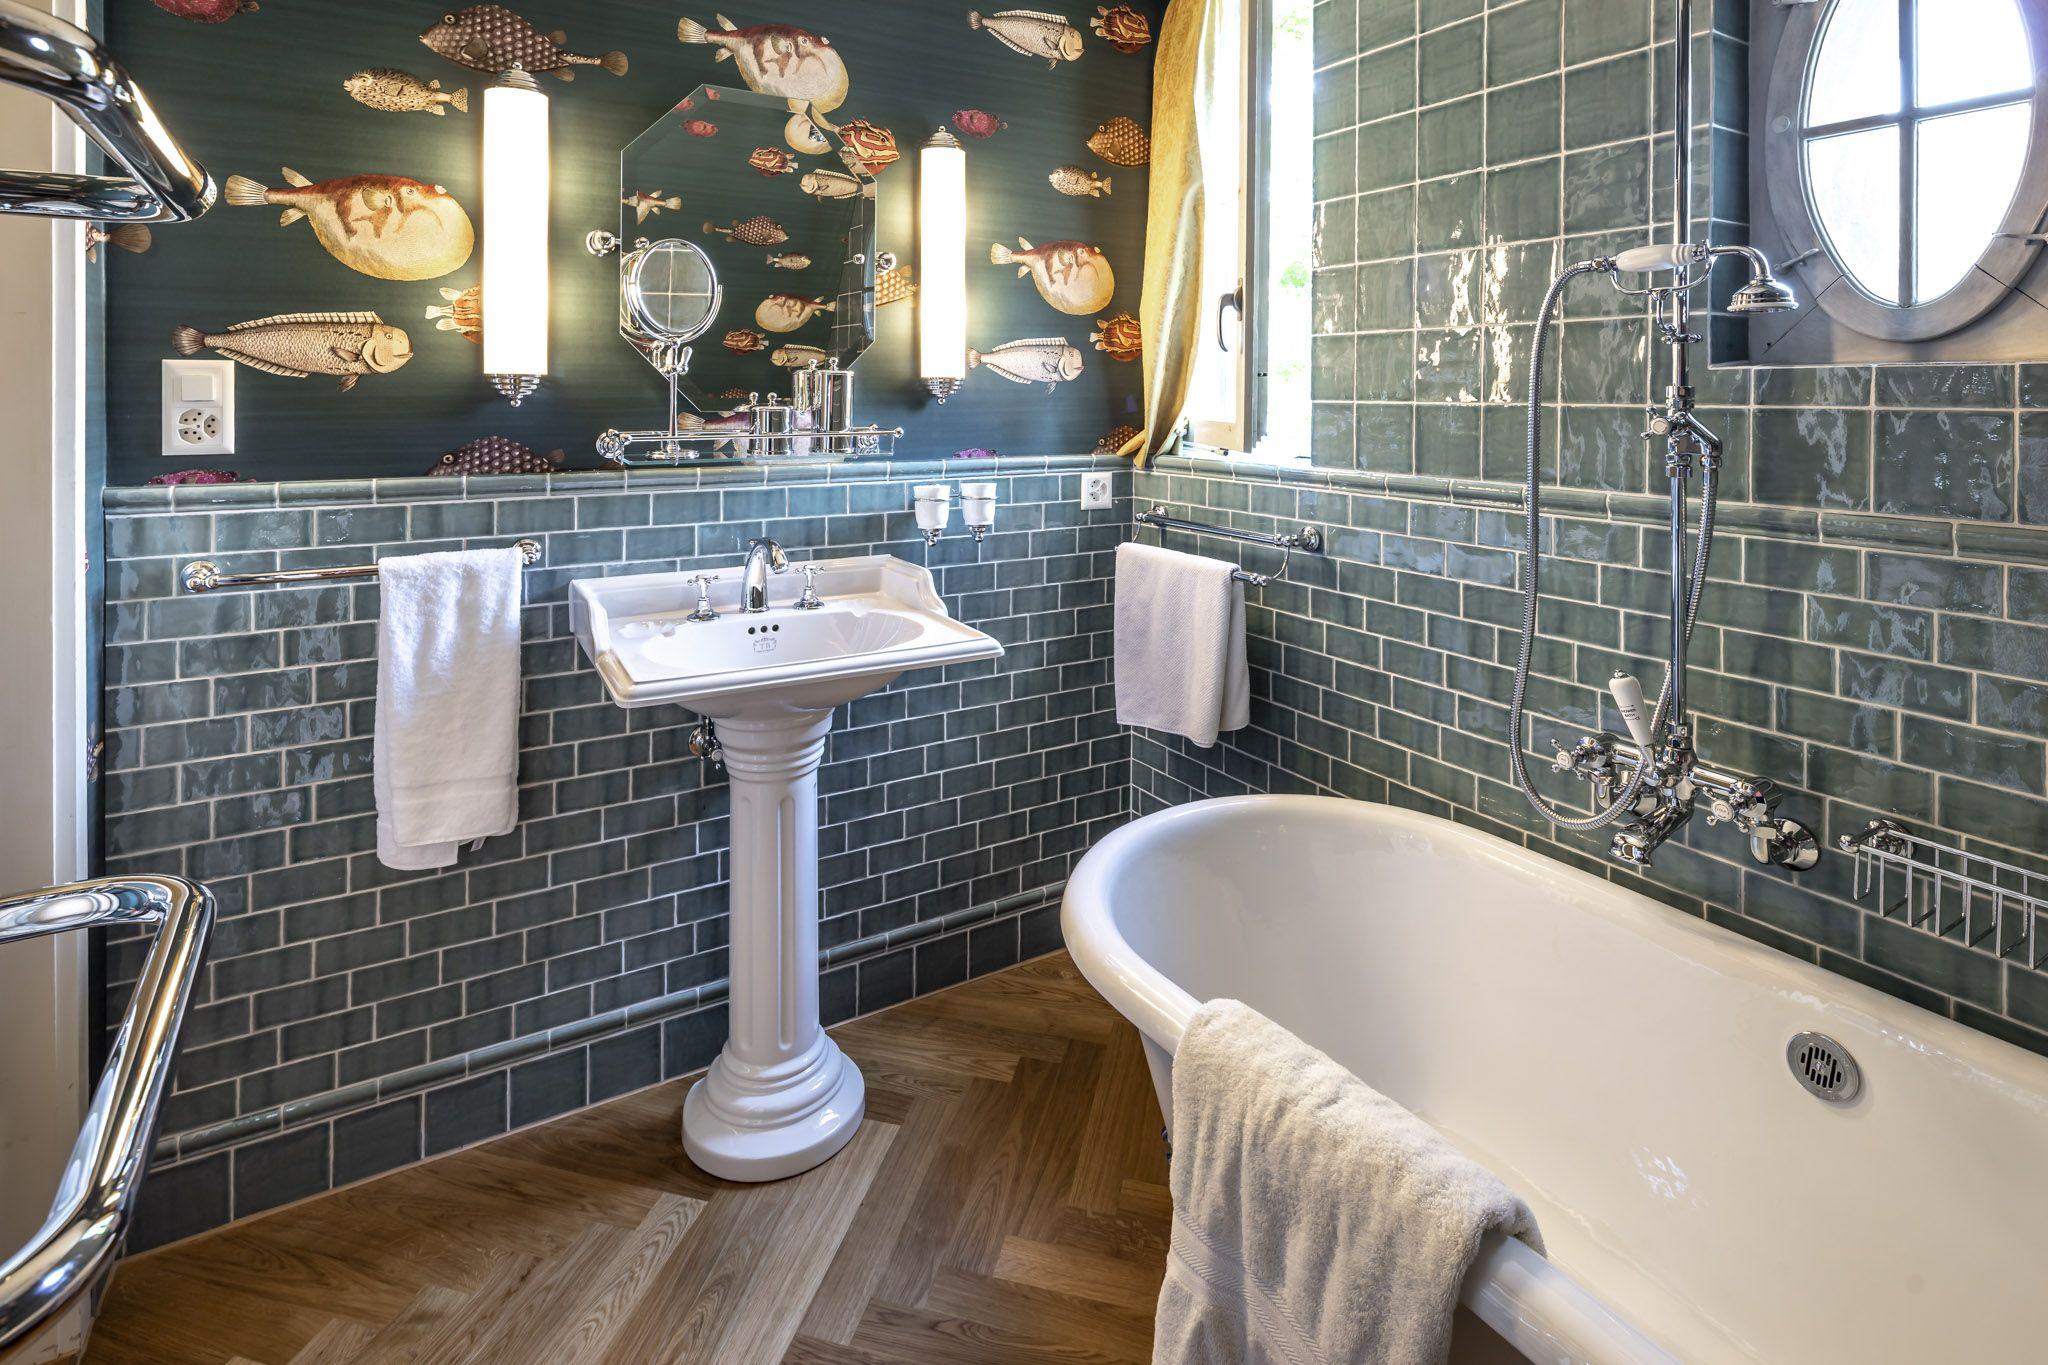 Vintage Badezimmer  Vintage badezimmer, Traditionelle bäder